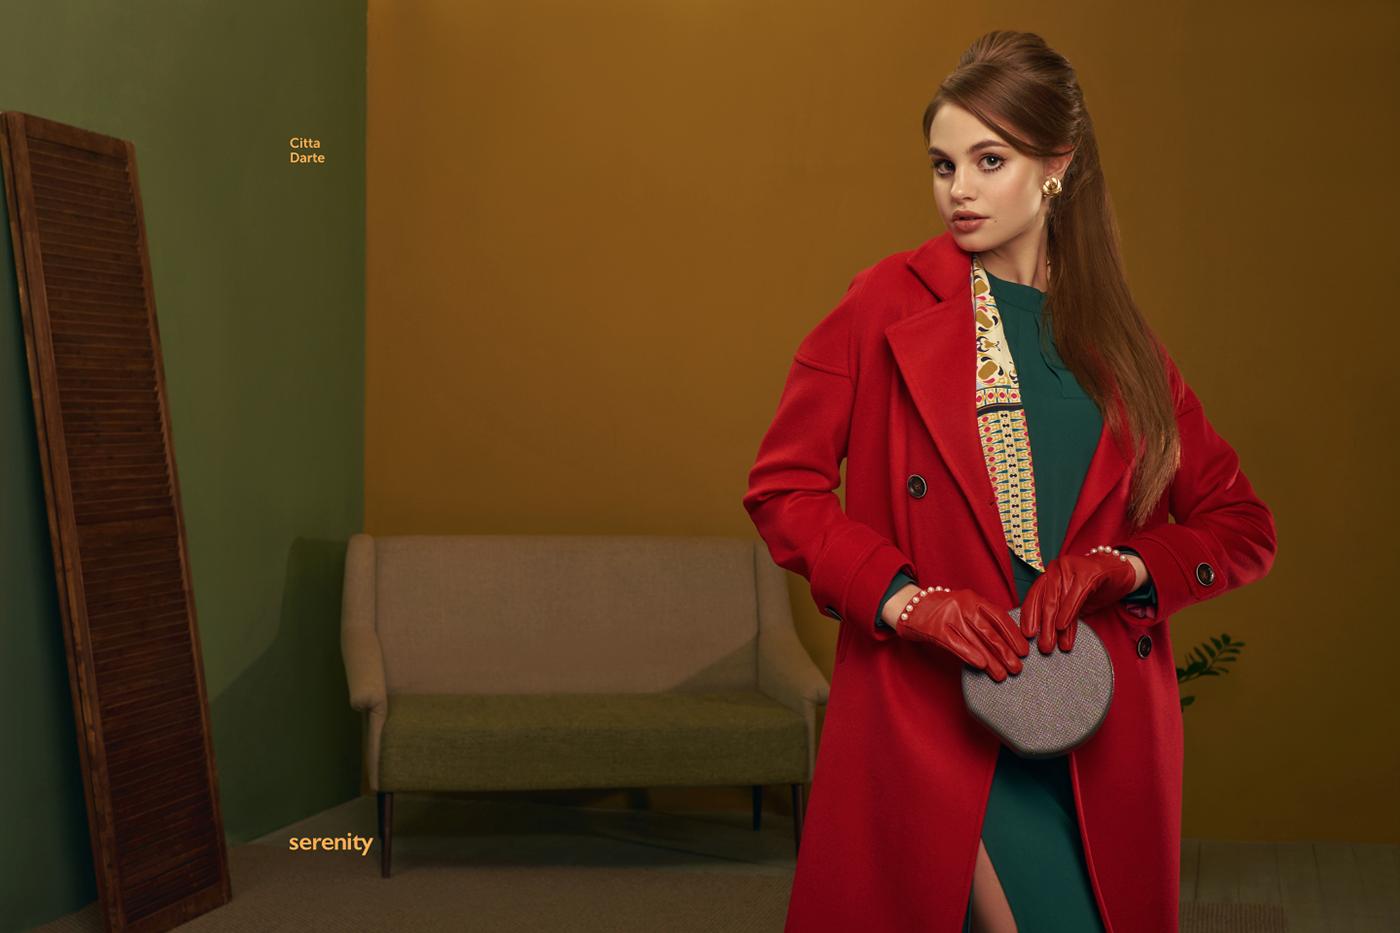 Fashion  Classic photo Style фотография одежда стиль мода